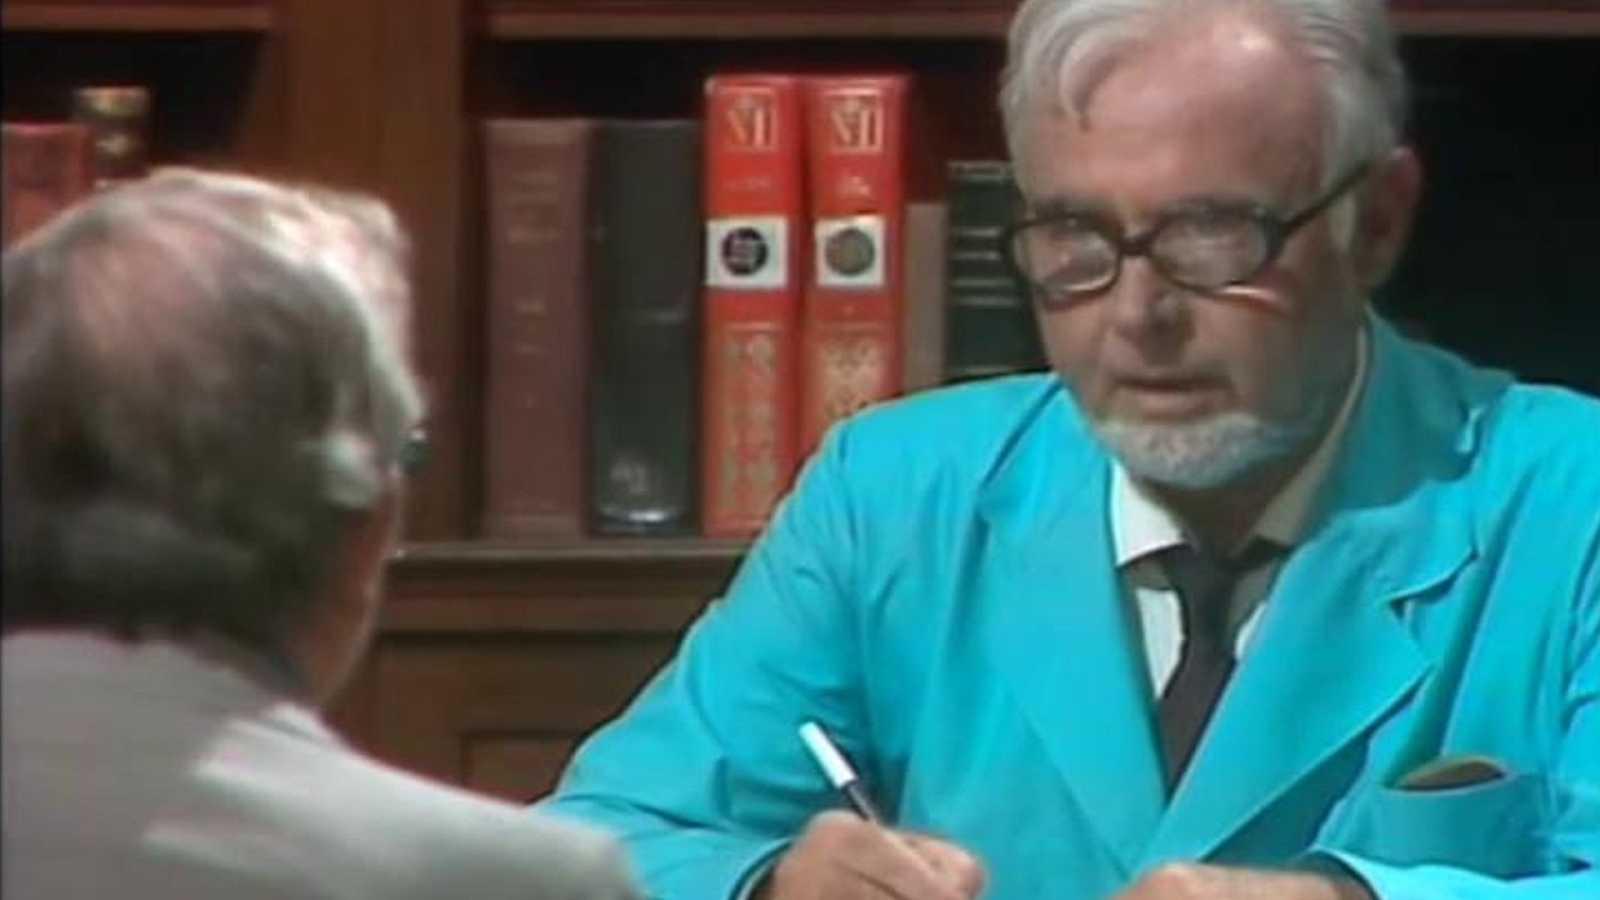 Vídeo del documental Memòries del doctor Caparrós